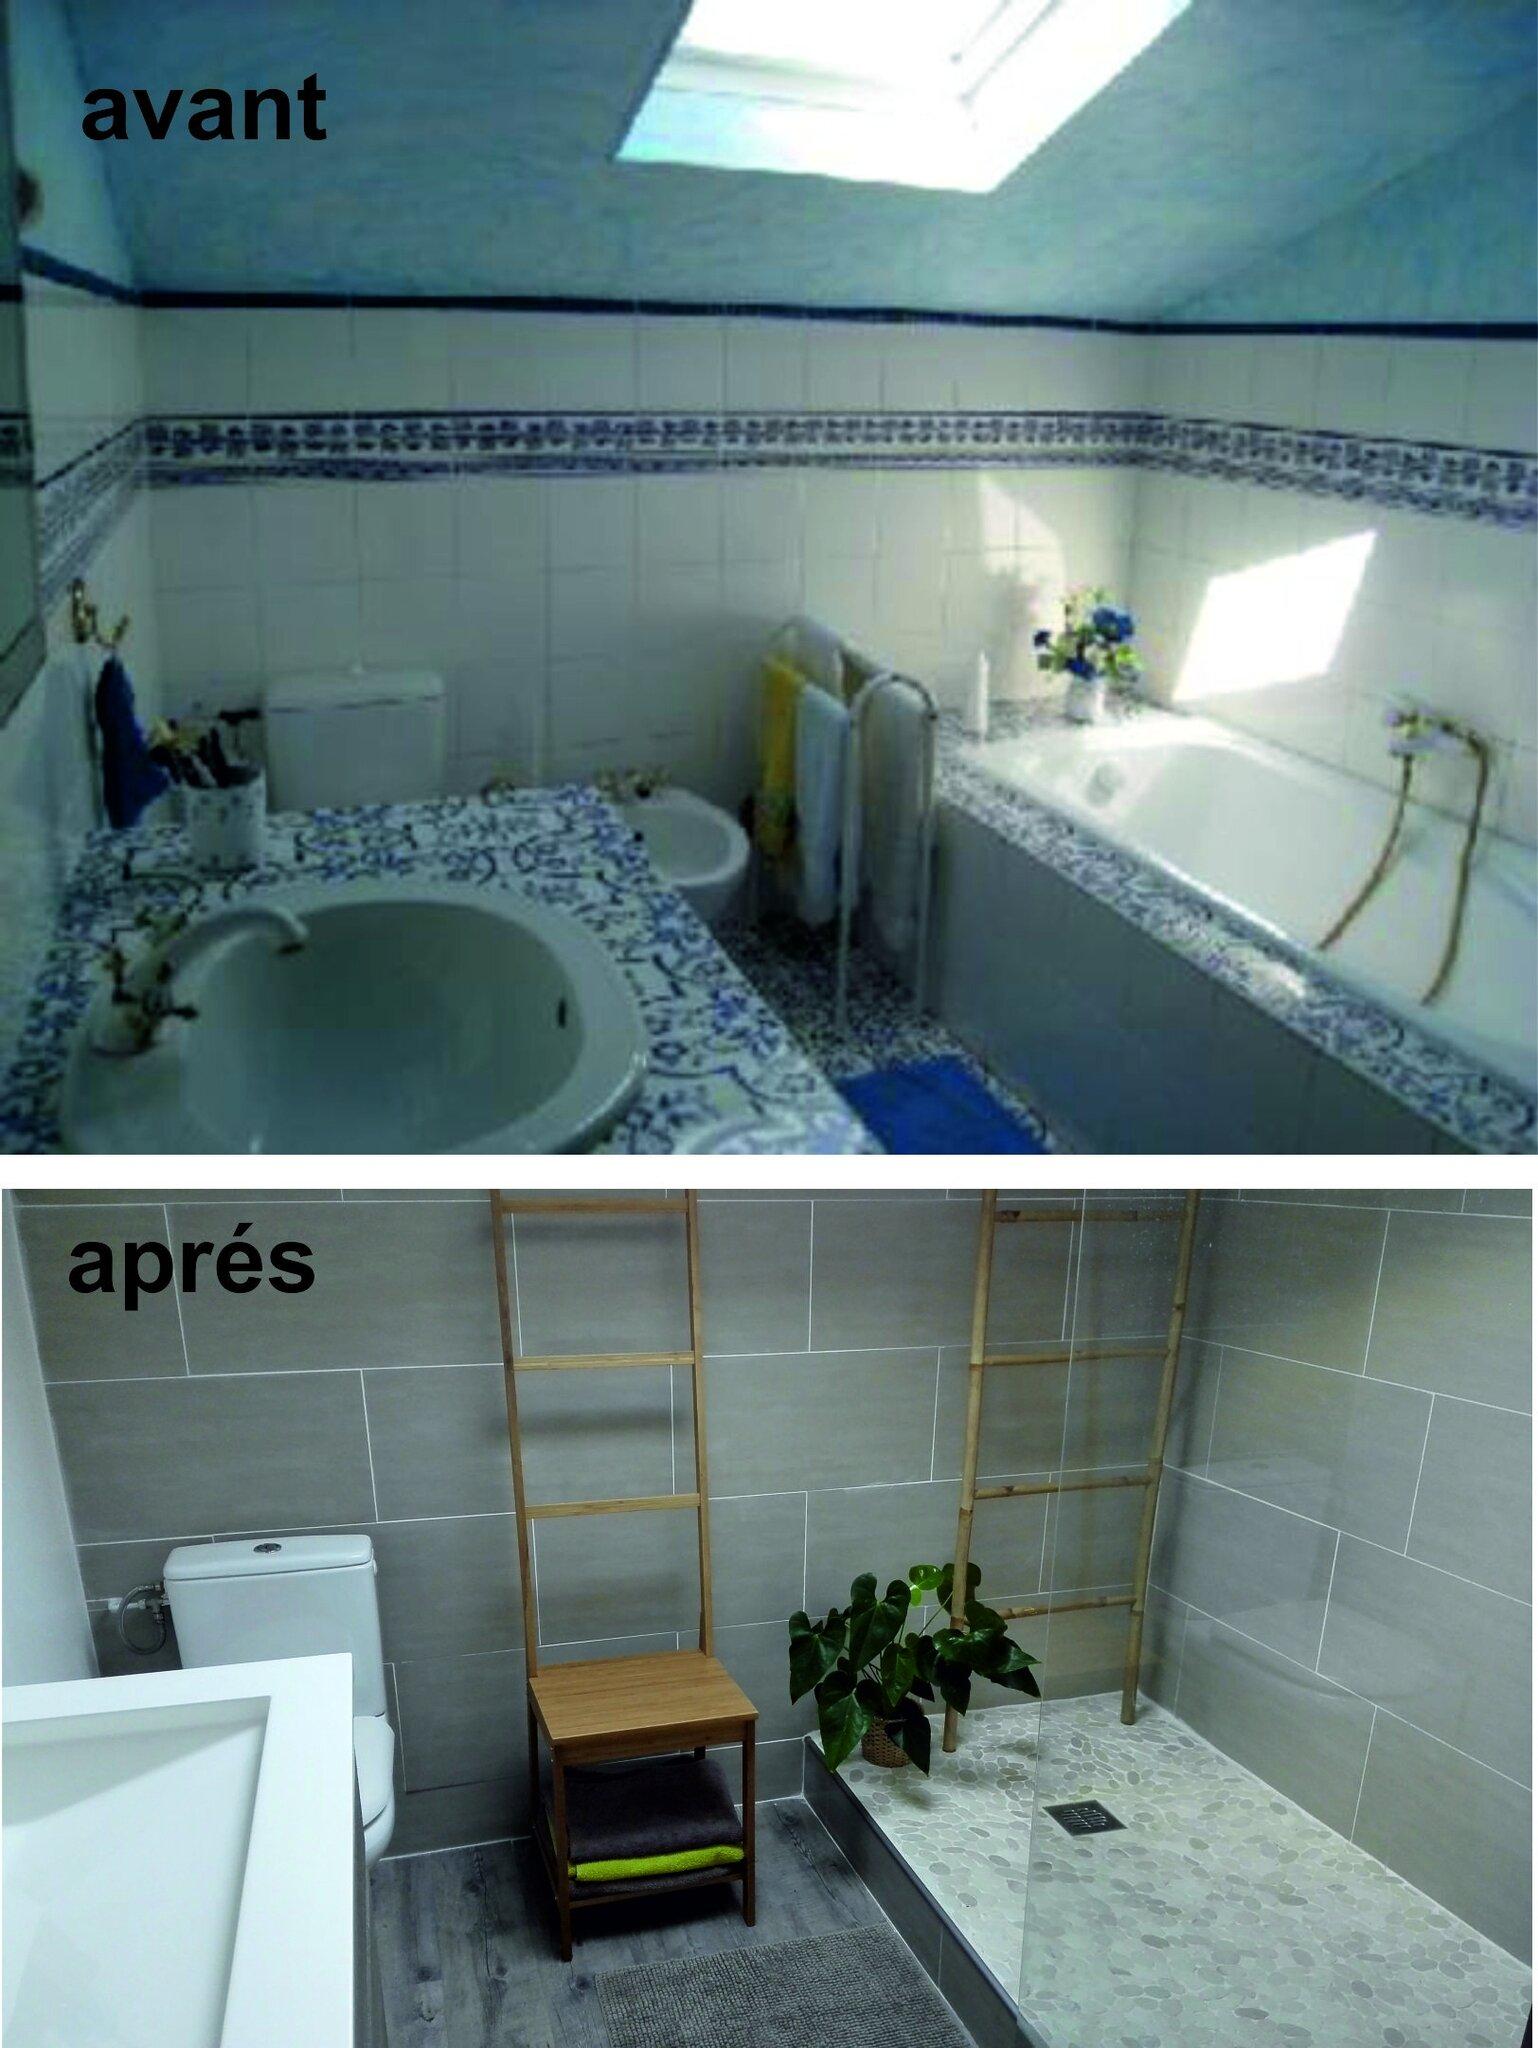 Deco Salle De Bain Avant Apres salle de bain avant apres - photo de deco interieure